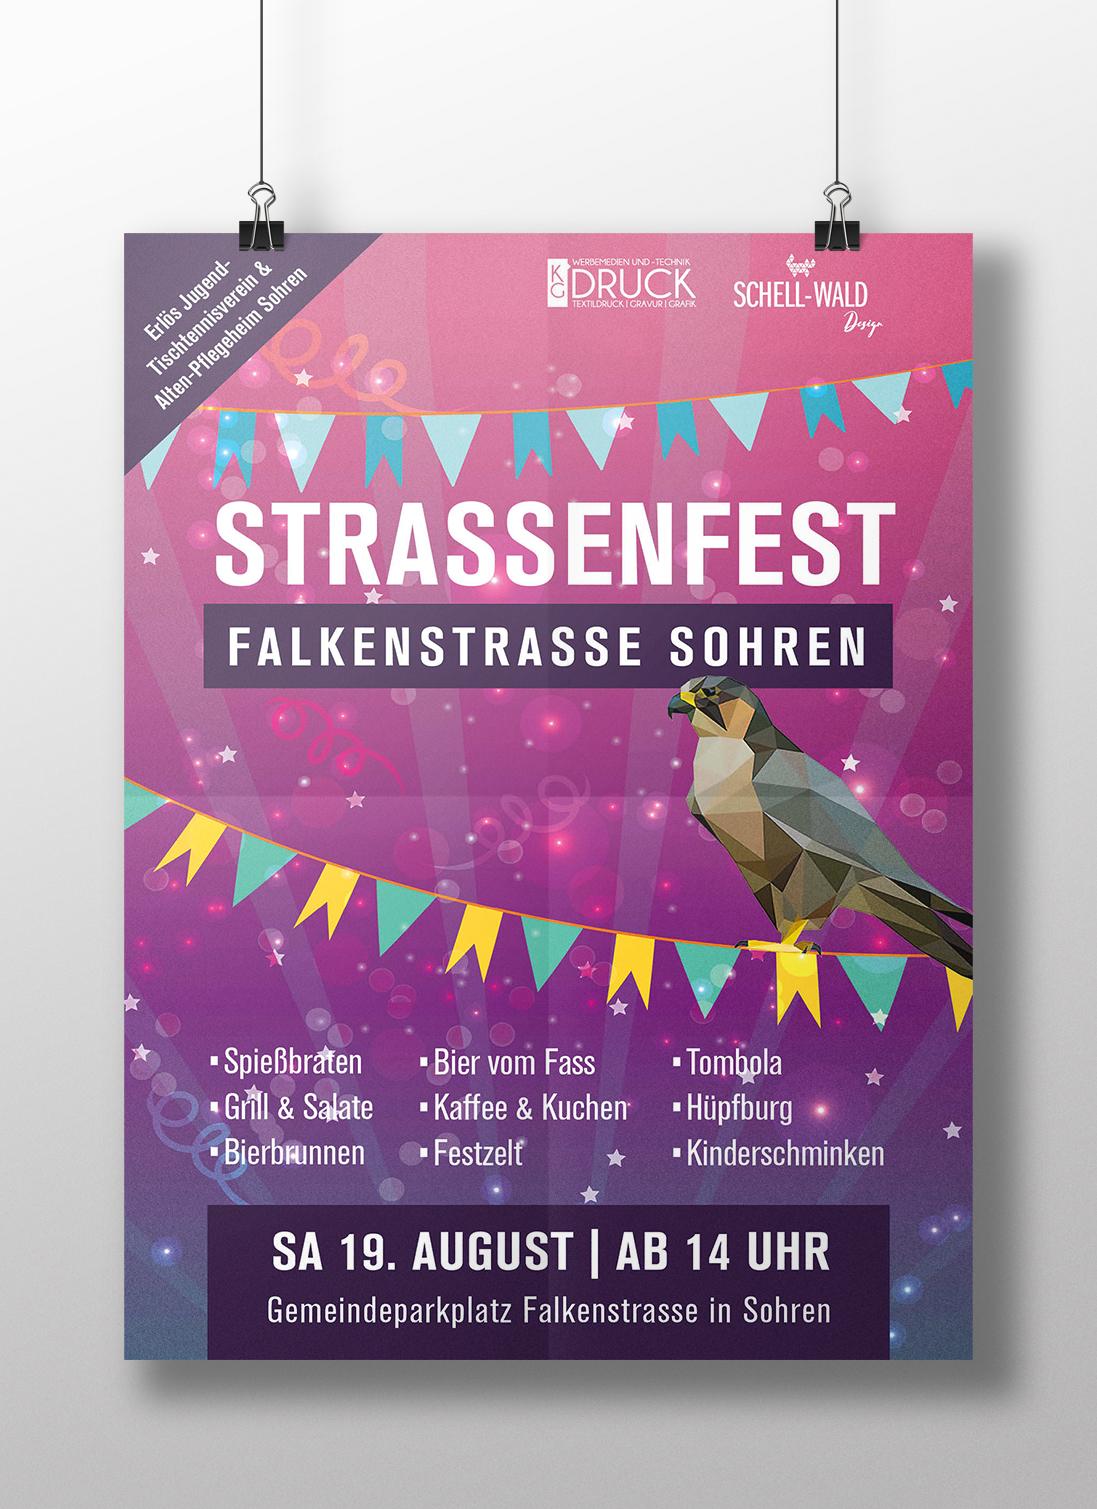 Falkenstrasse-plakat